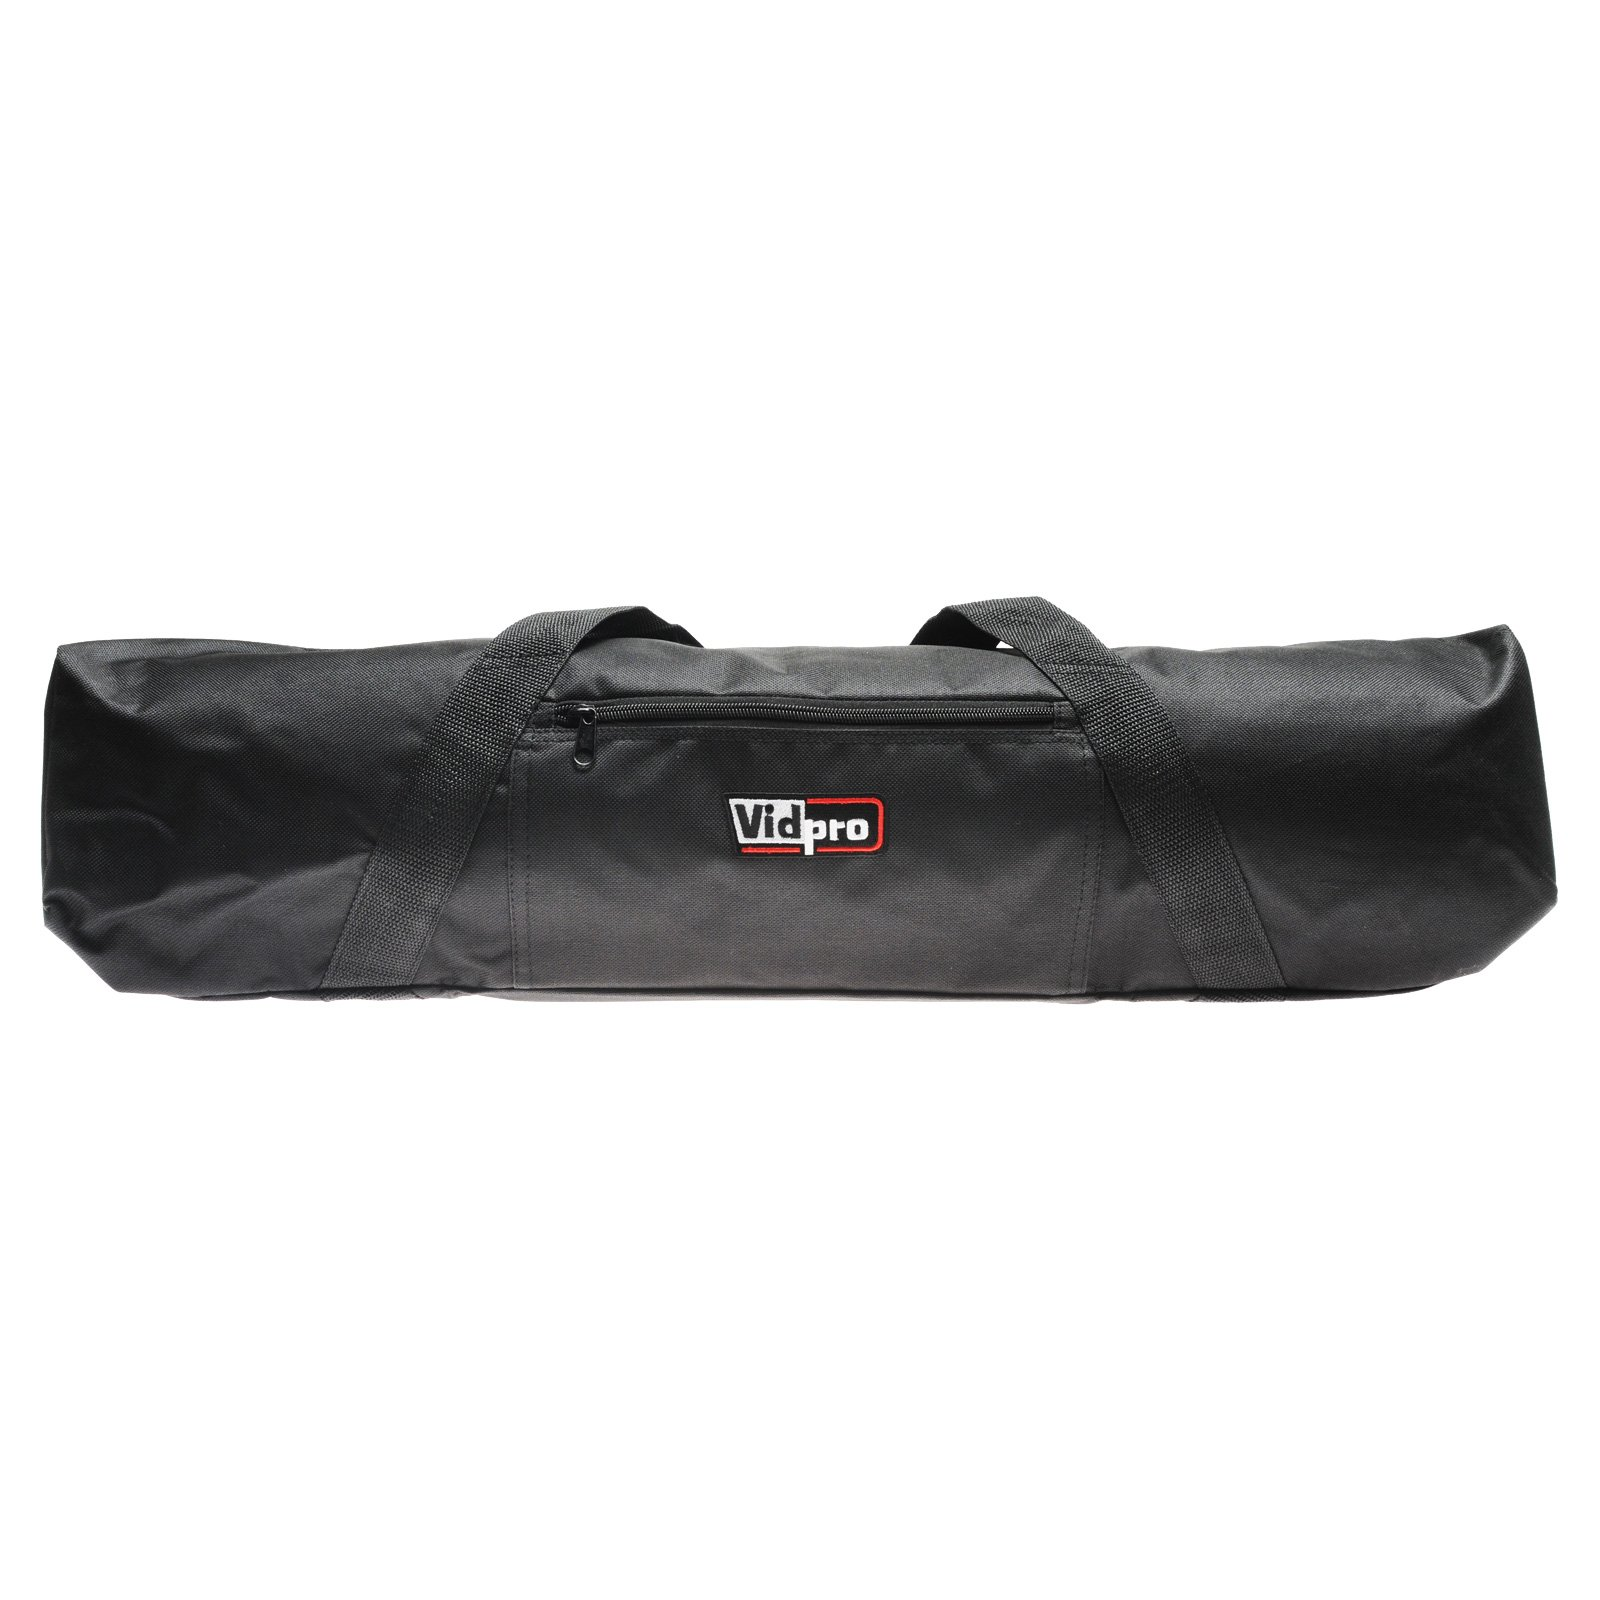 VidPro TC-22 Padded Tripod Bag carries 22-inch Long Tripods by Vidpro